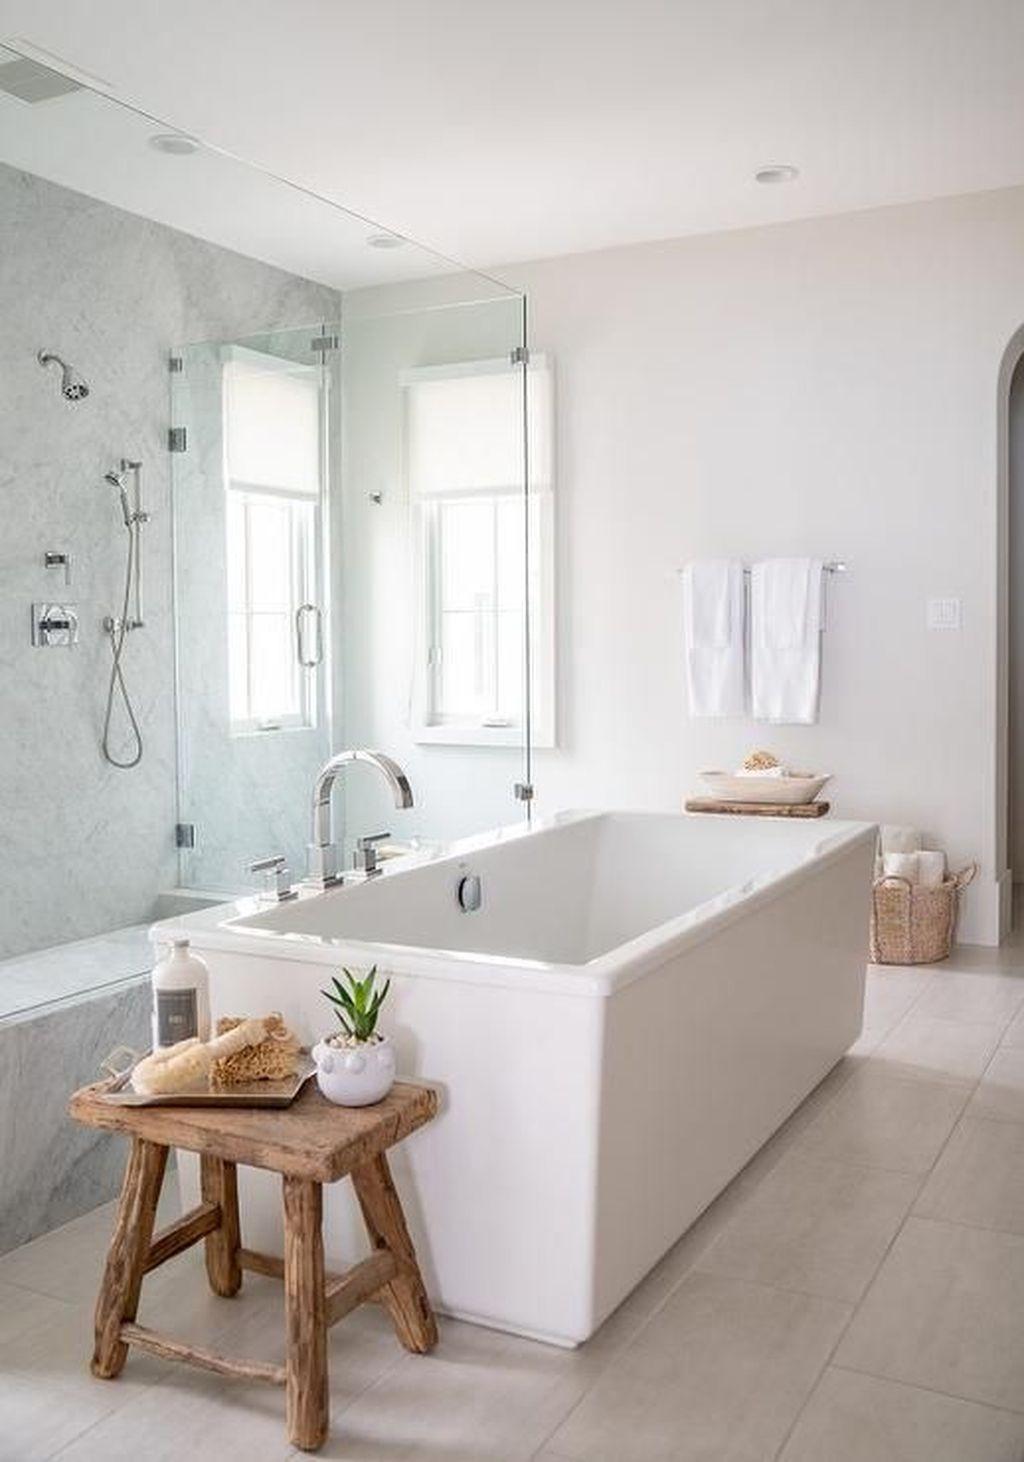 Marvelous Wooden Shower Floor Tiles Designs Ideas For Bathroom Remodel 25